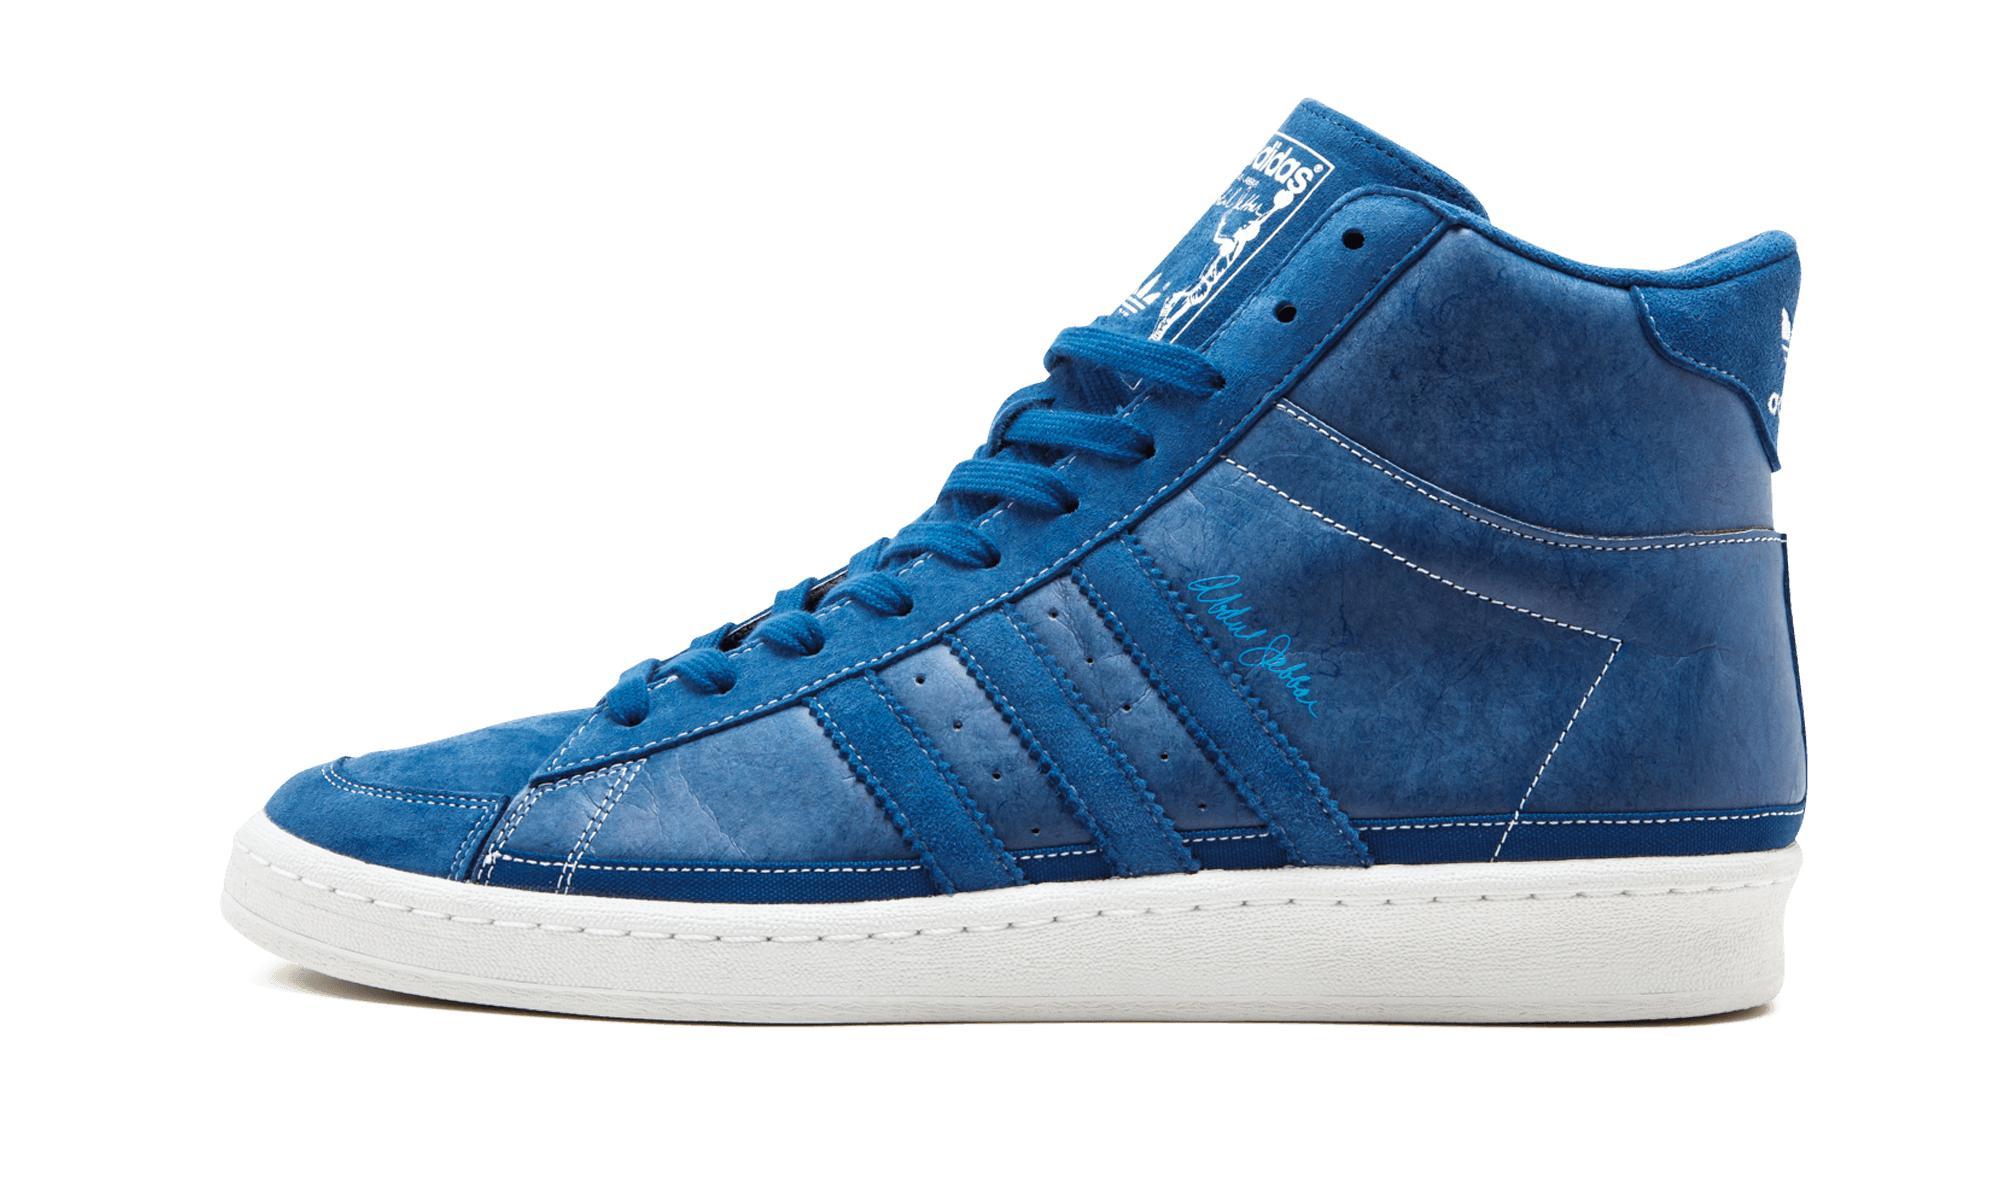 Lyst - adidas Jabbar Hi in Blue for Men a0cffa8a8